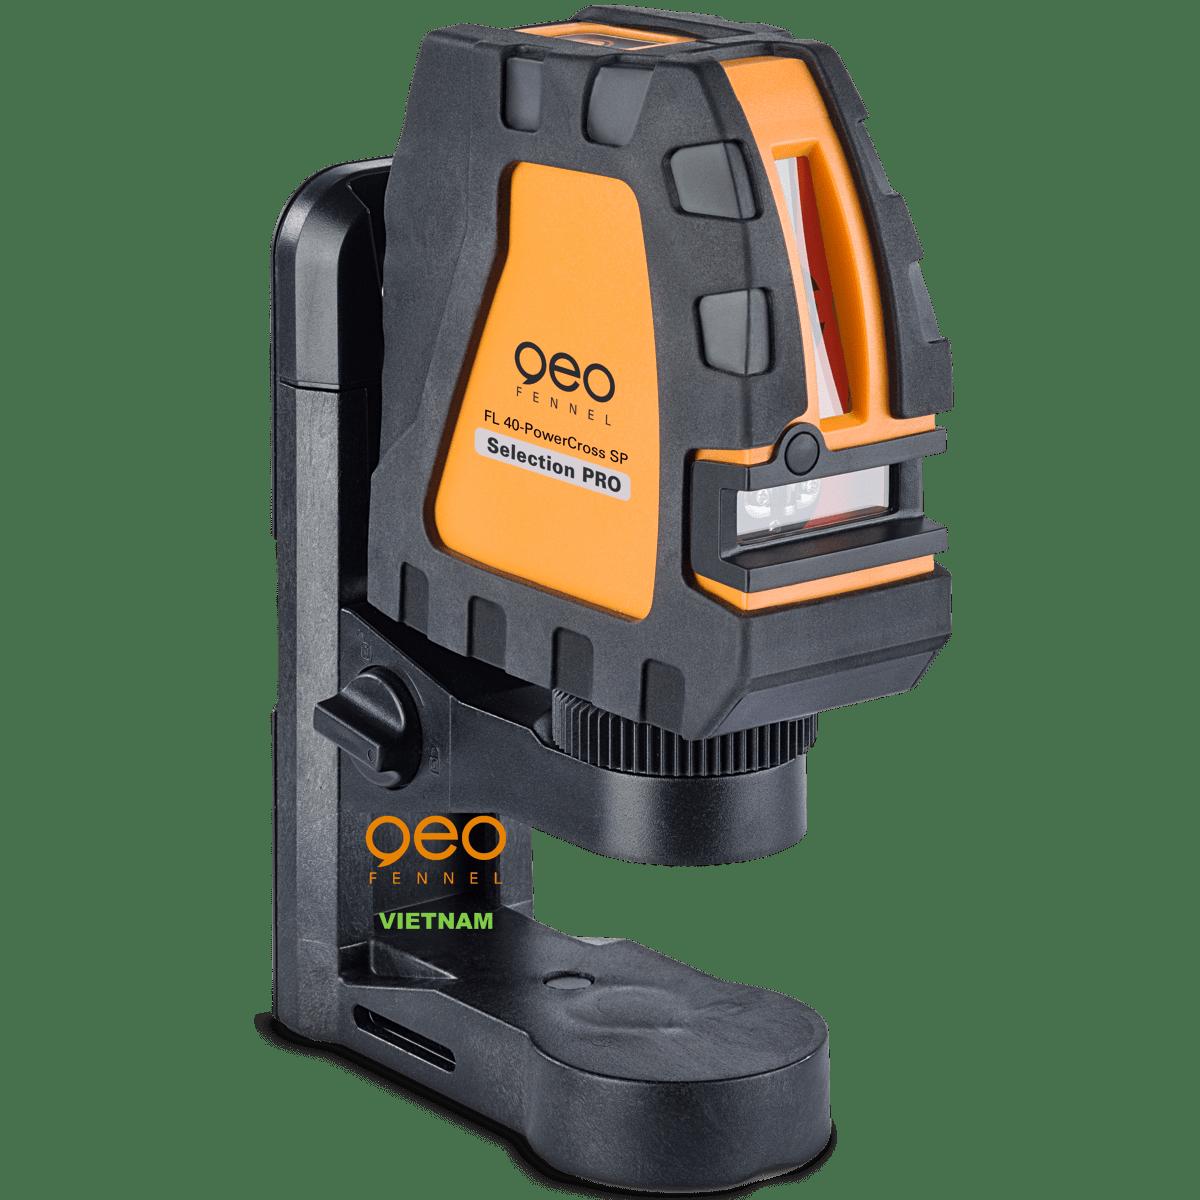 Máy thuỷ bình laser FL40-Powercross SP | GEO-Fennel Vietnam